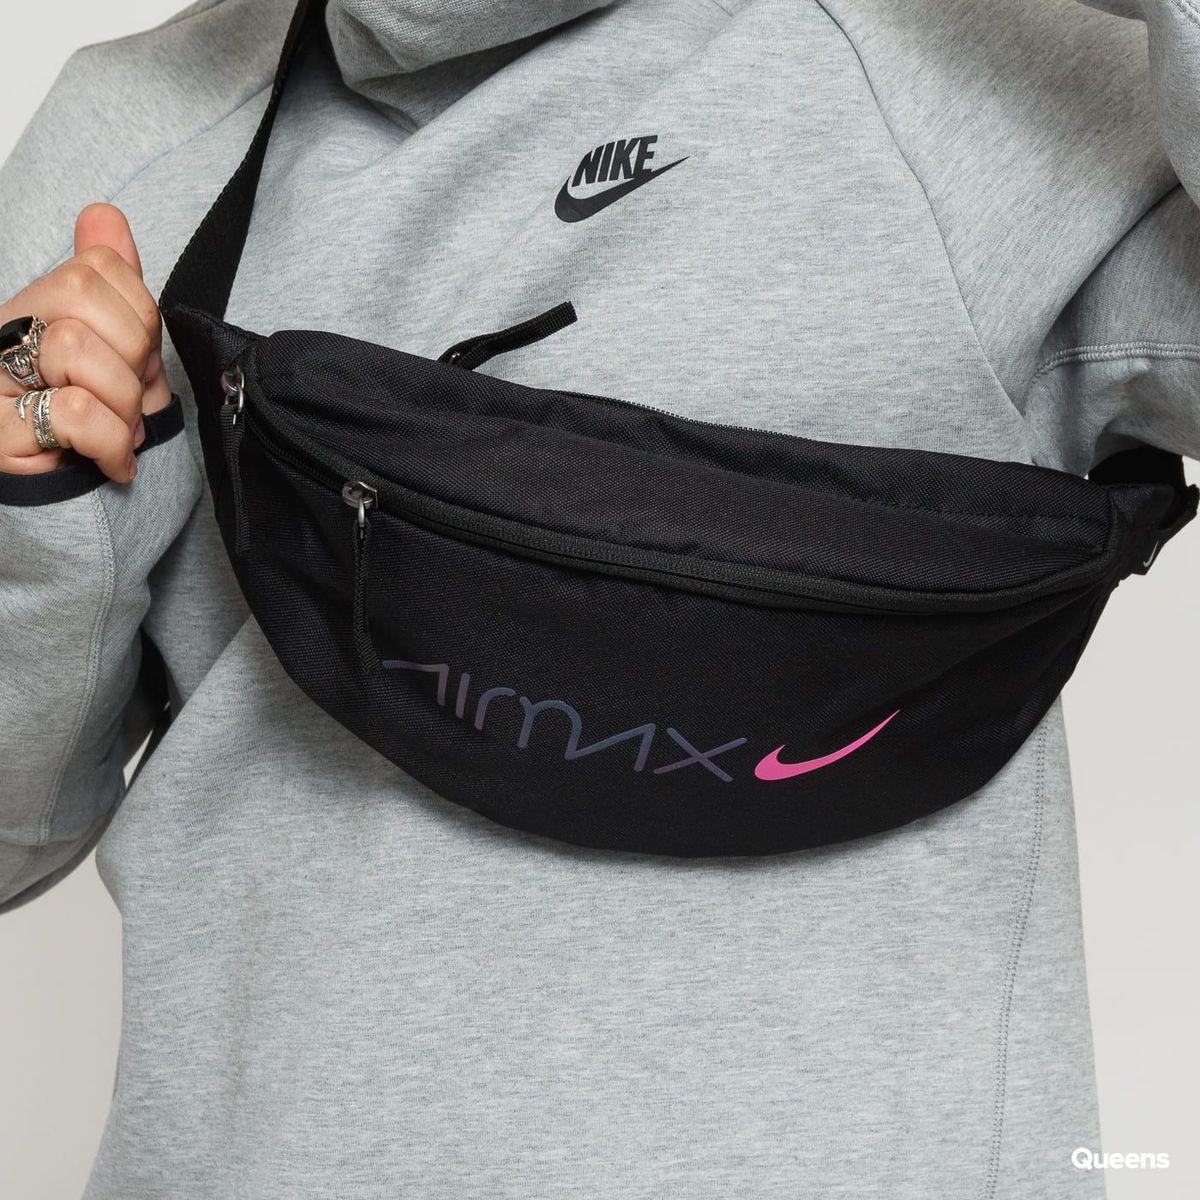 f1bb22ea4 Pochete Nike Air Max Day Preto Rosa Bag Original | Bolsa Masculina Nike  Nunca Usado 33602384 | enjoei